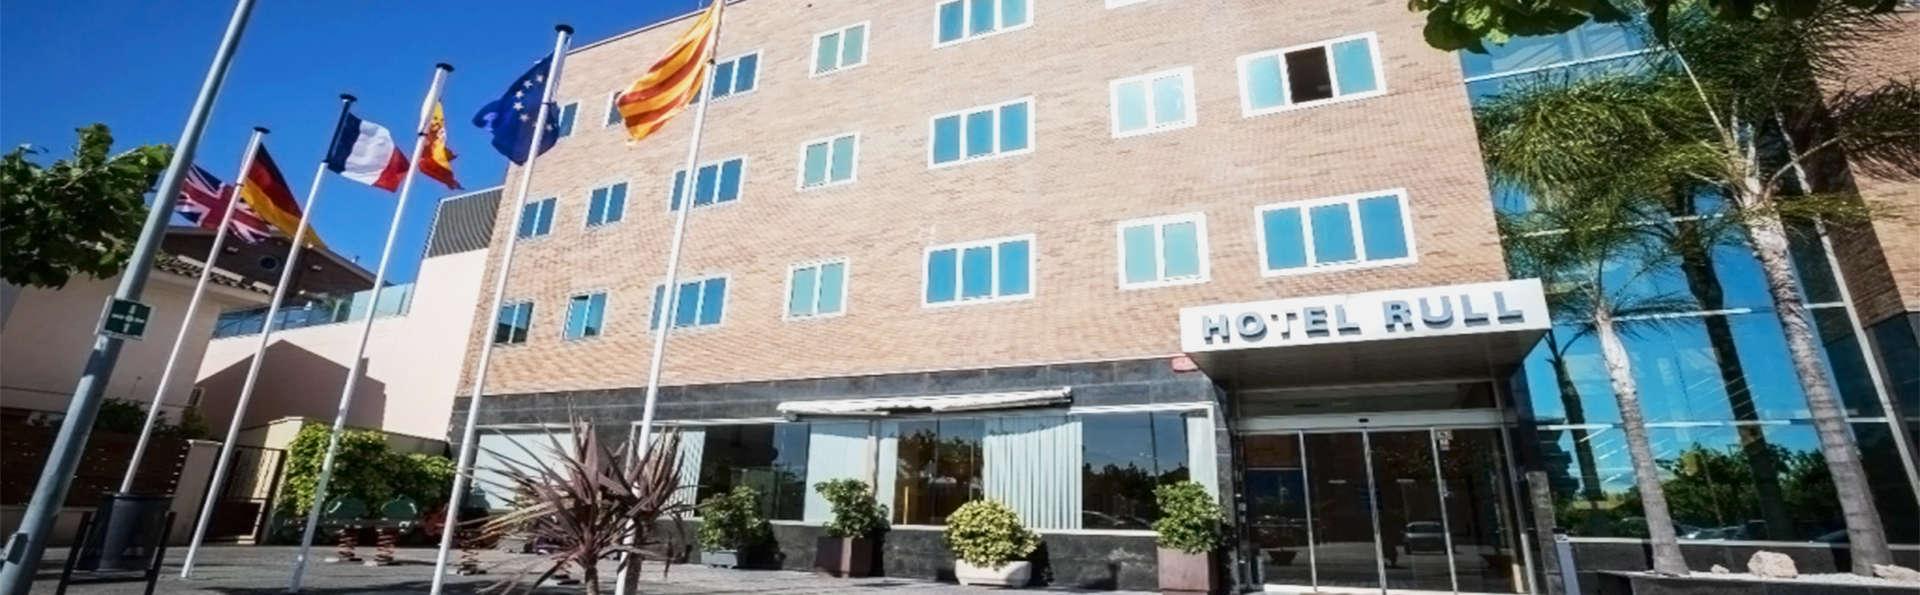 Hotel Rull - EDIT_2_Fachada.jpg